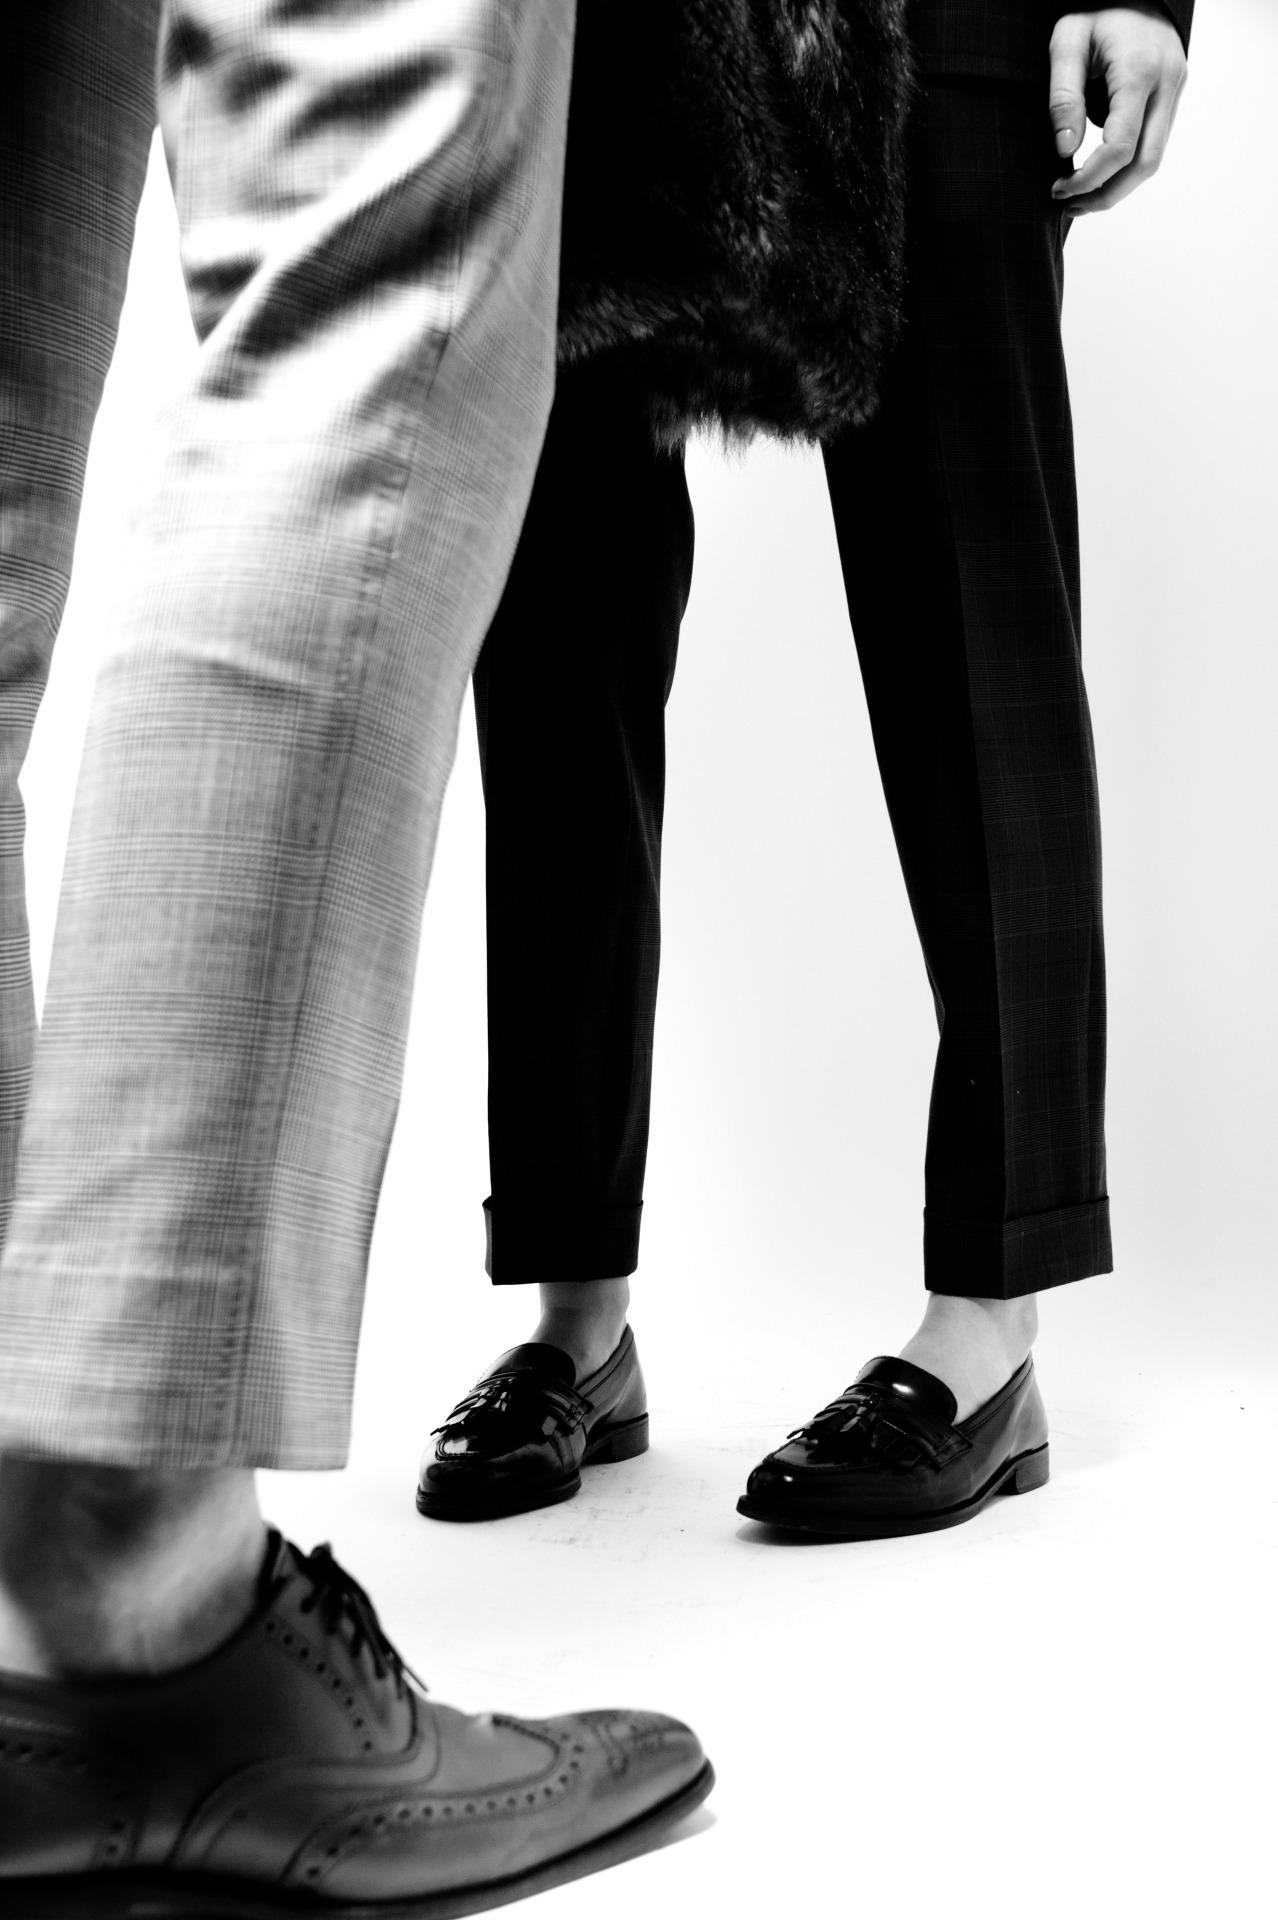 endarkenment :     Shoes by    Matthew Pandolfe         for  GRANDPASTYLE.com